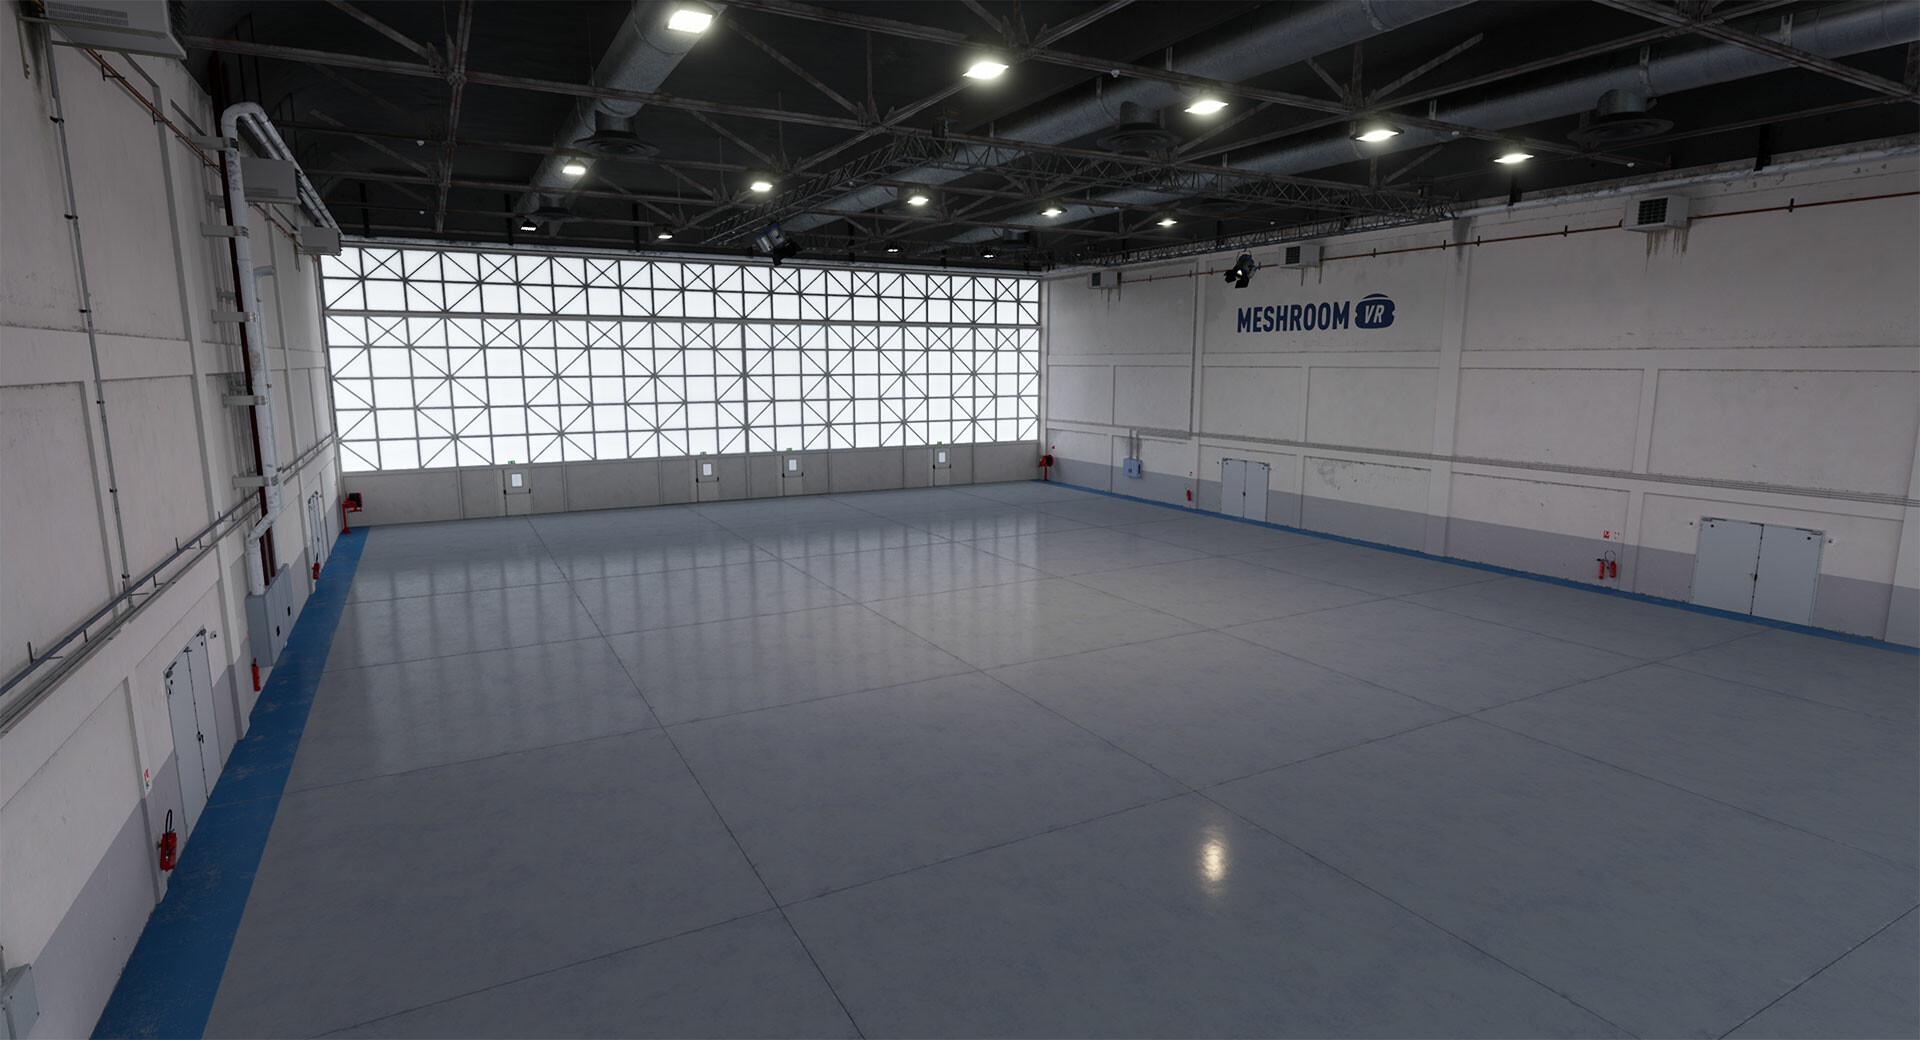 MeshroomStudio_WarehouseEnvironment  2018 - Production